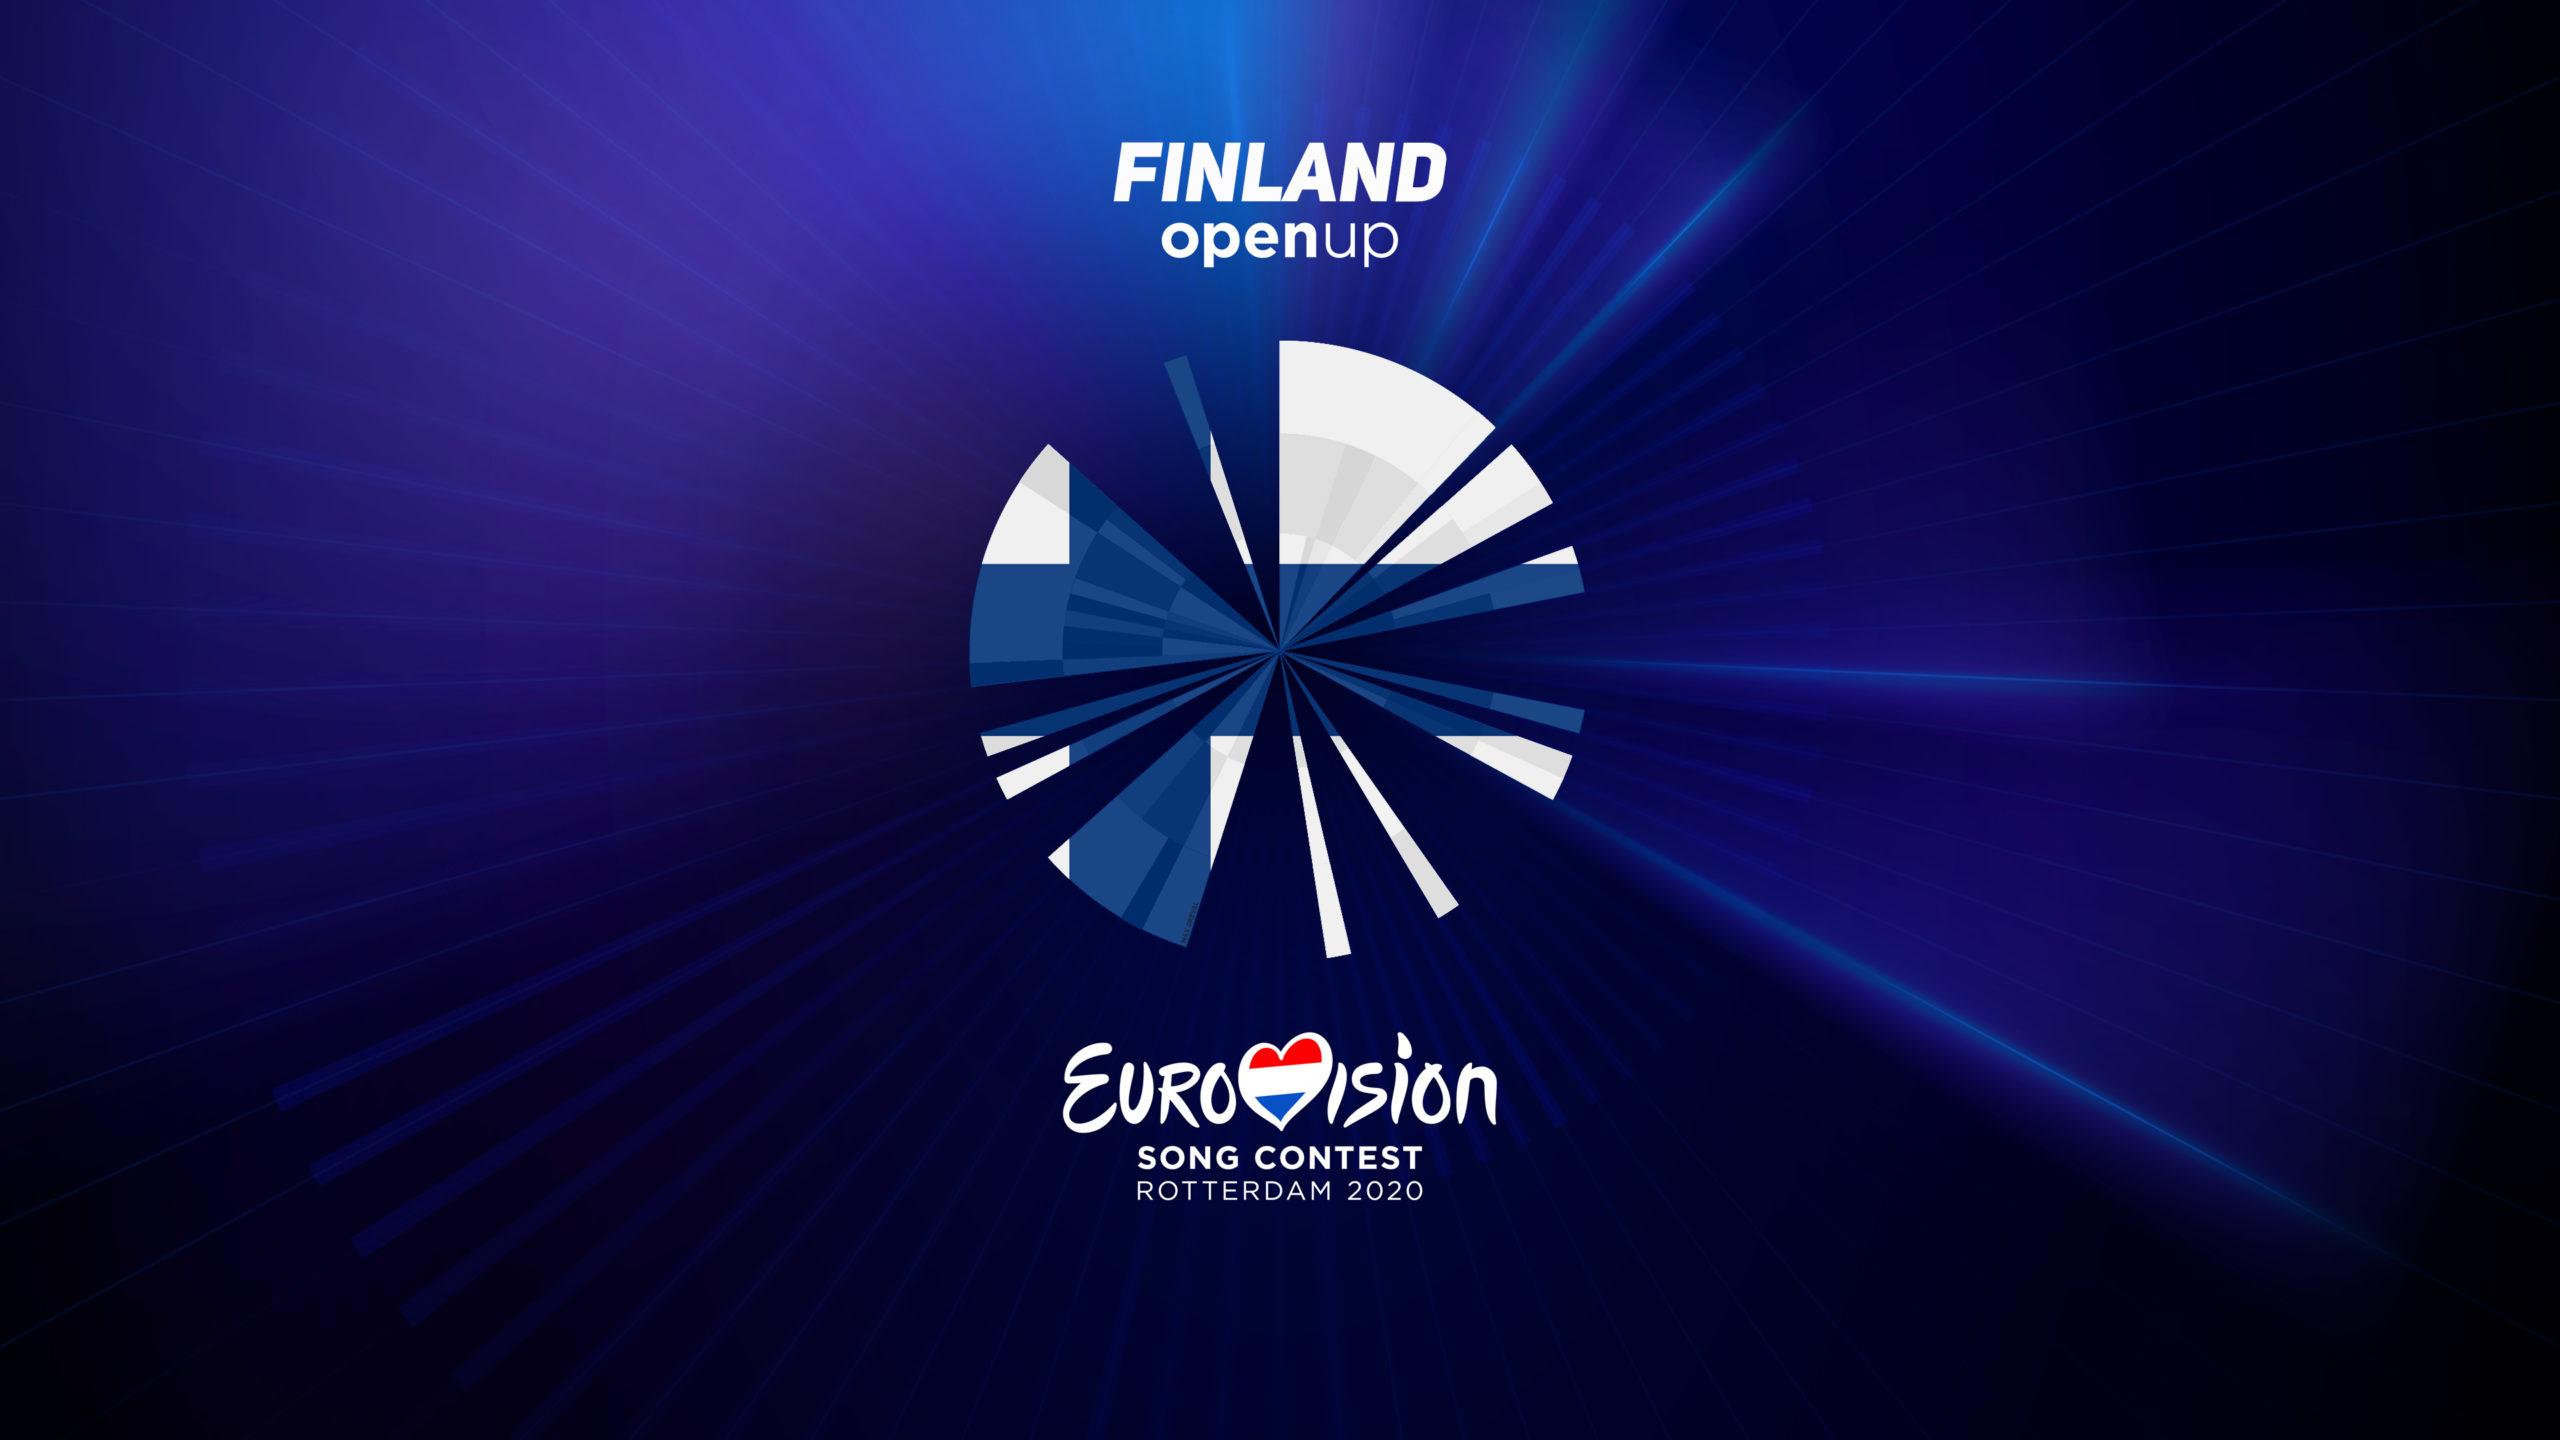 Finland-scaled.jpg